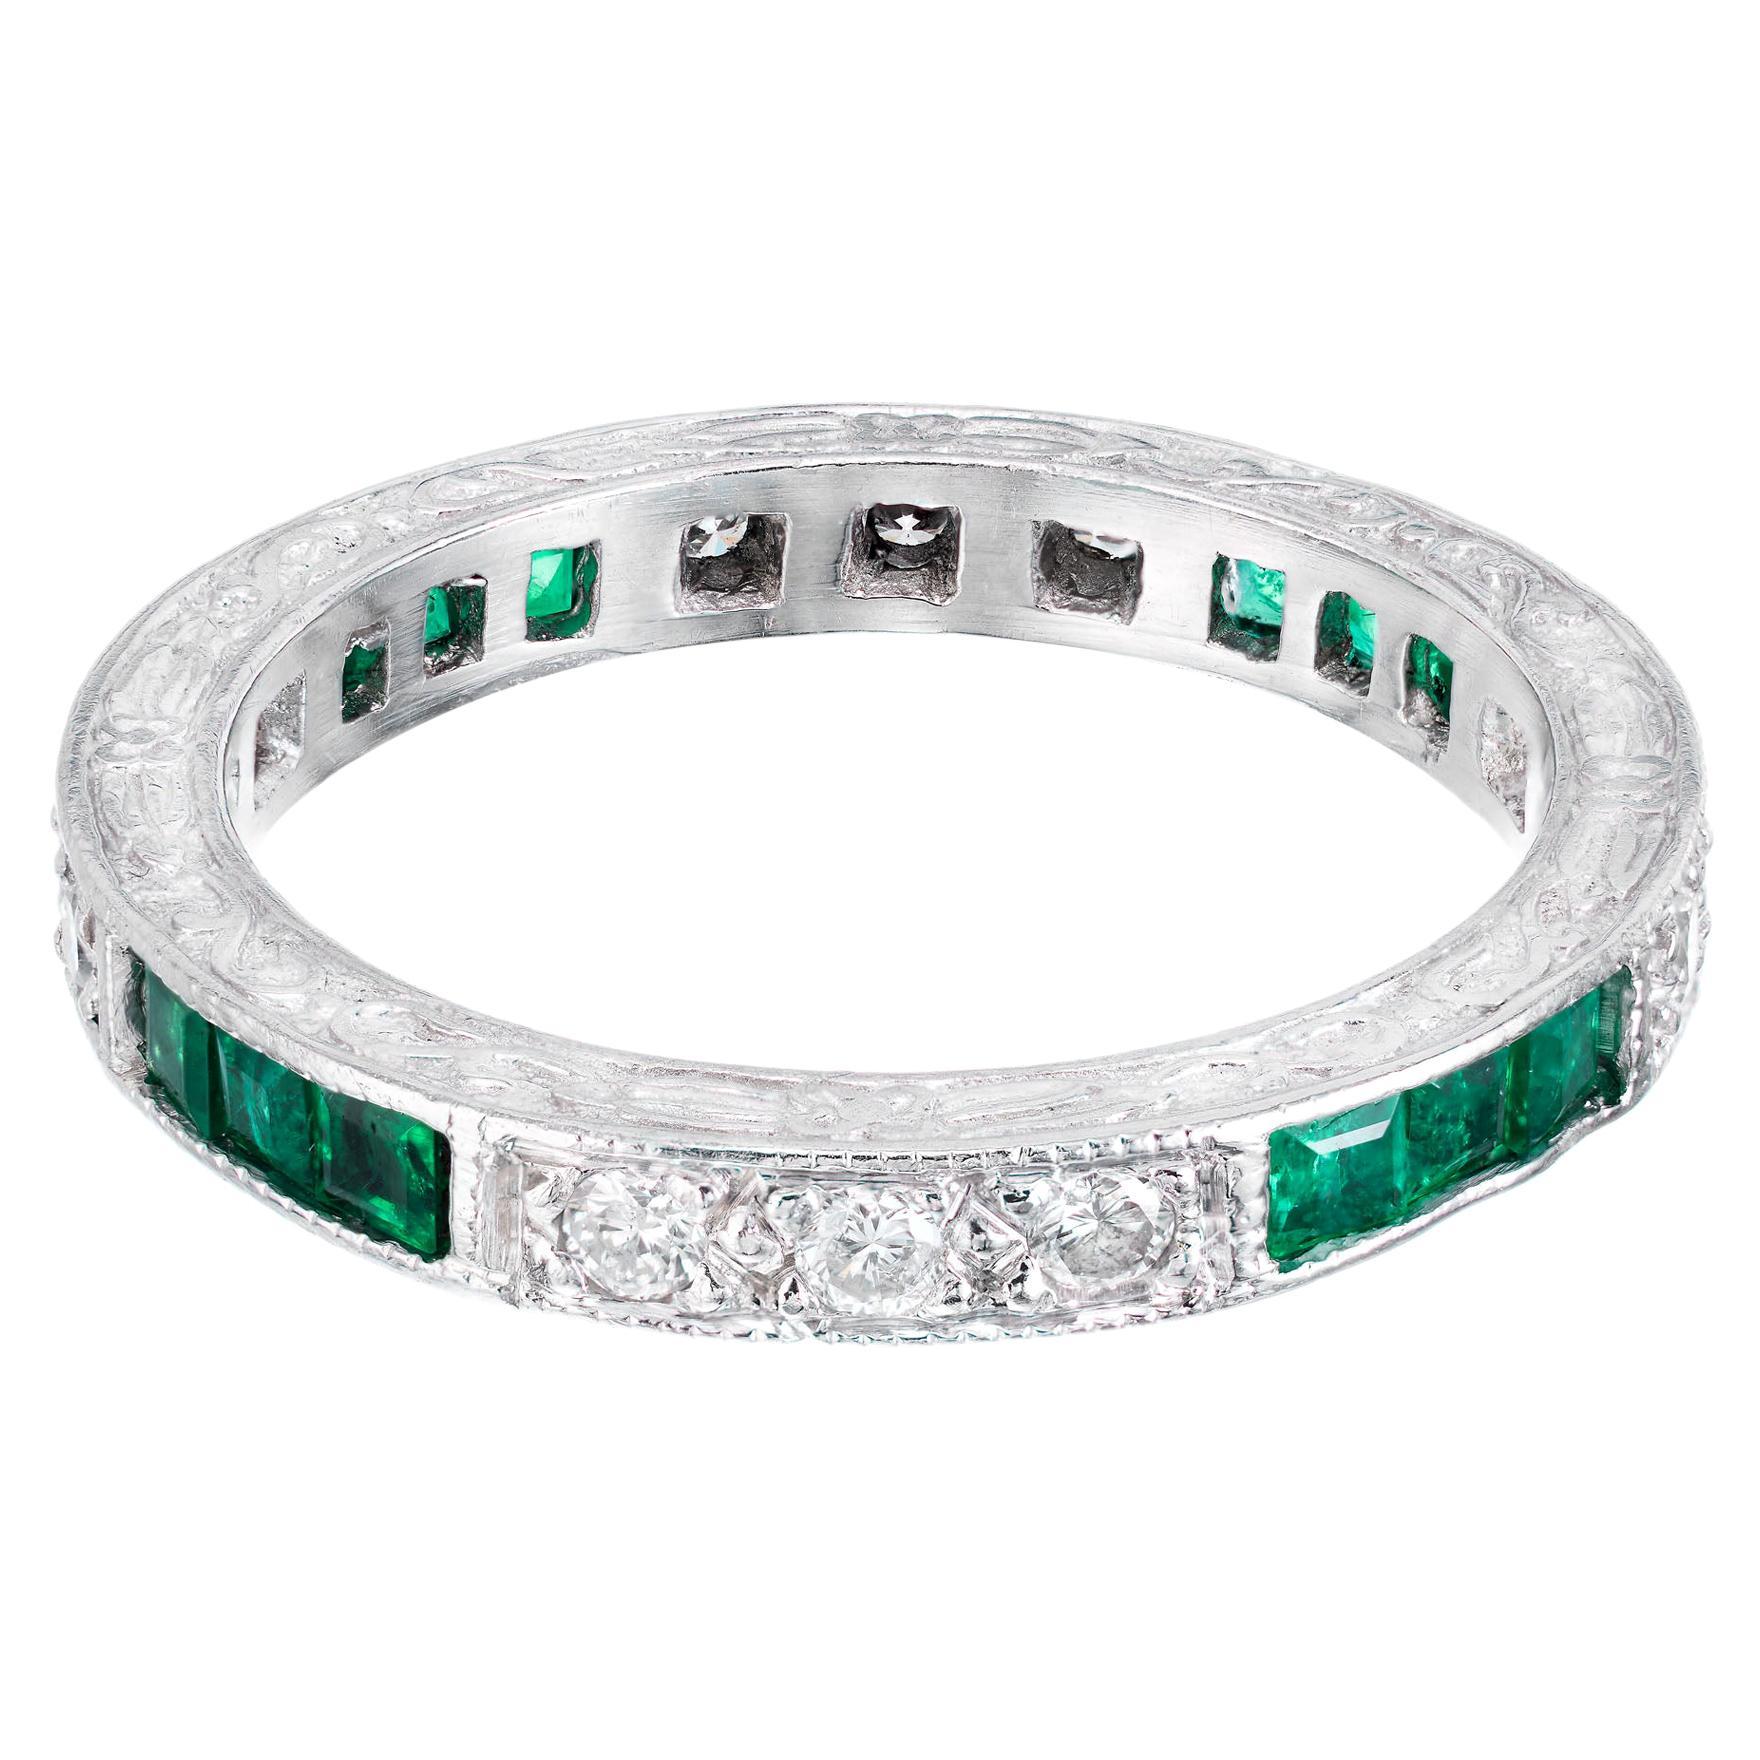 Peter Suchy 1.40 Carat Emerald Diamond Platinum Eternity Wedding Band Ring